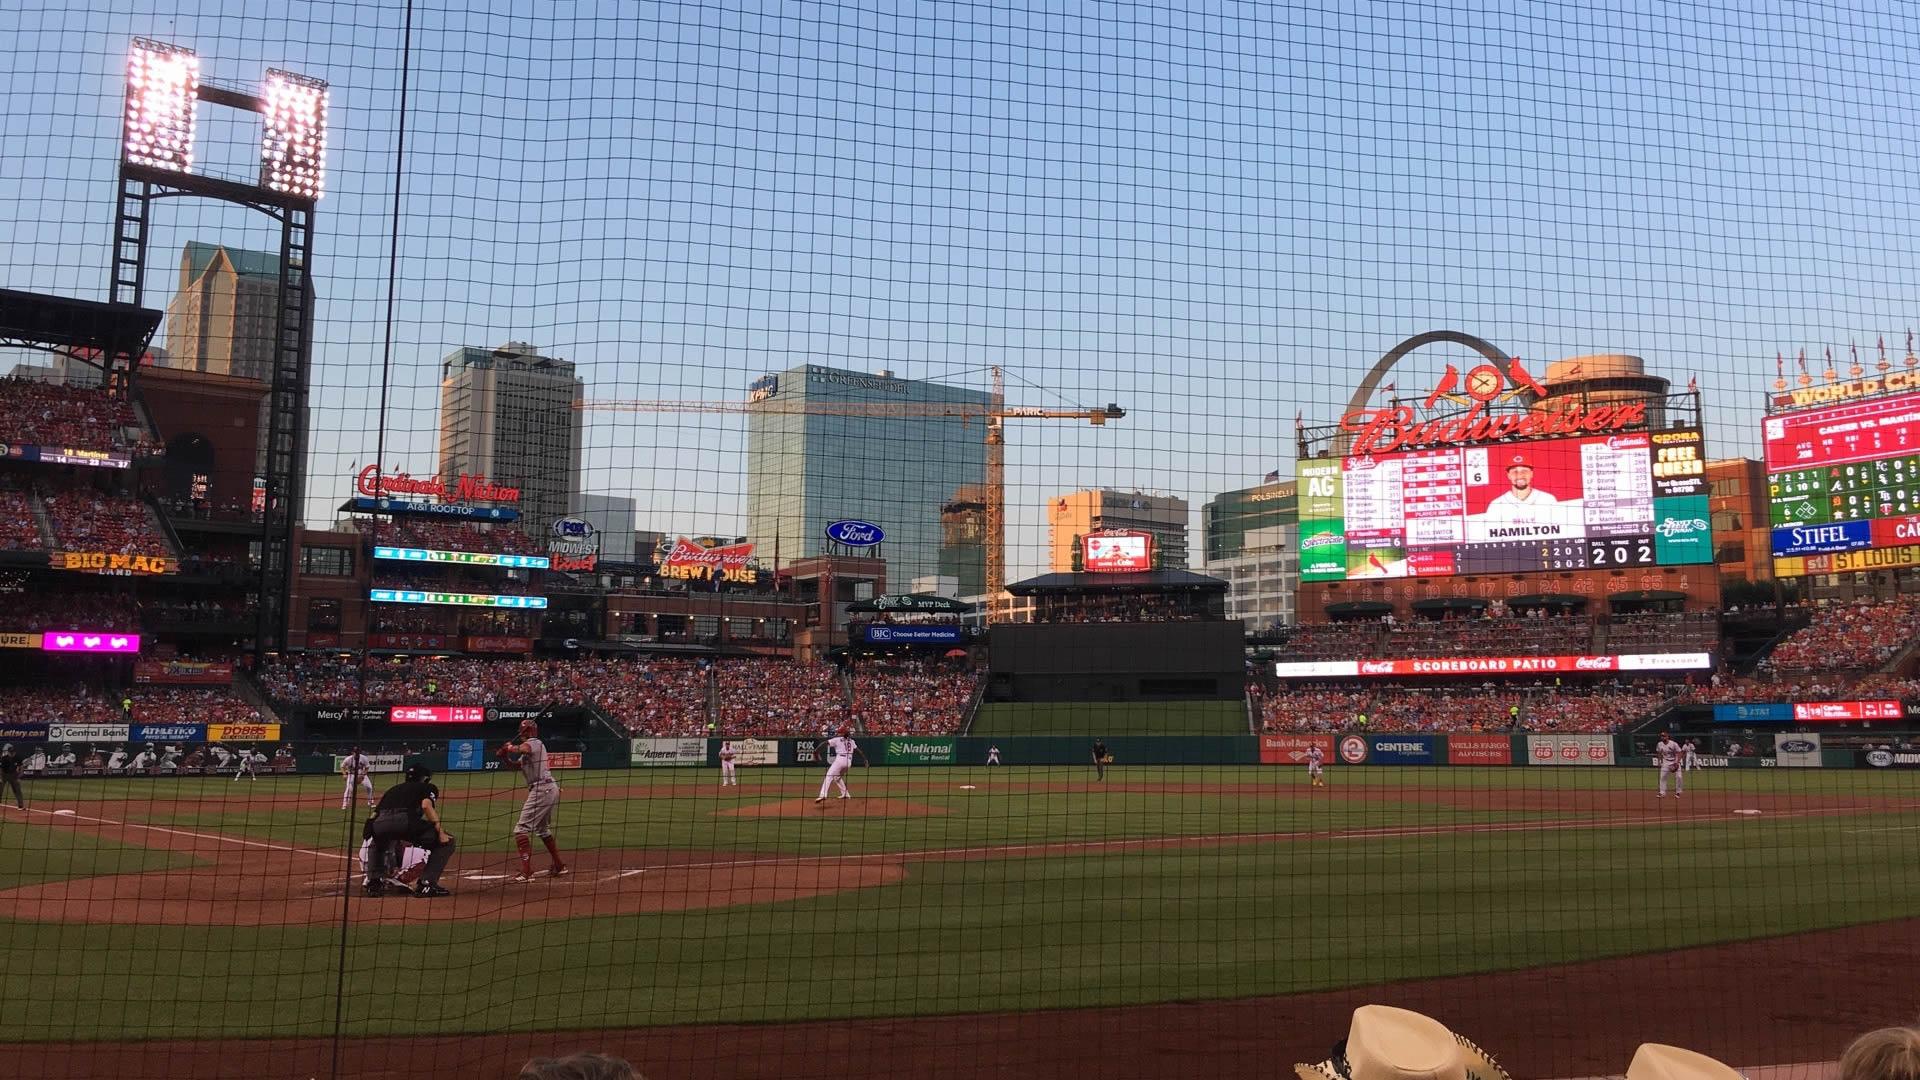 Cardinals Club 3 seat view